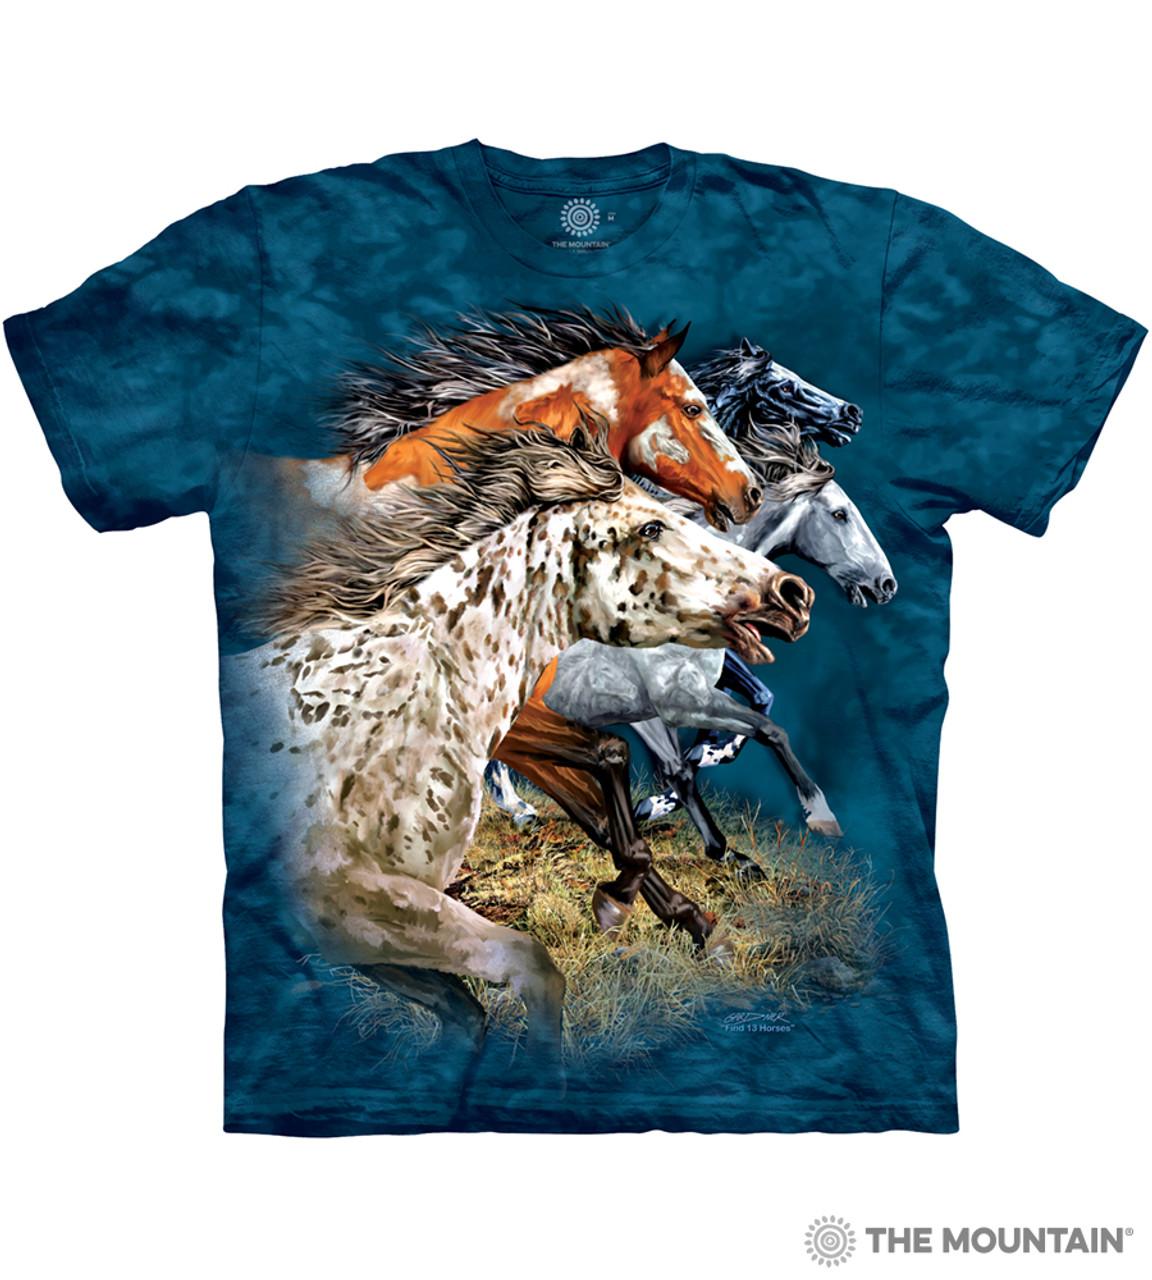 The Mountain Adult Unisex T-Shirt Running Free Horses Men/'s Blue Tee